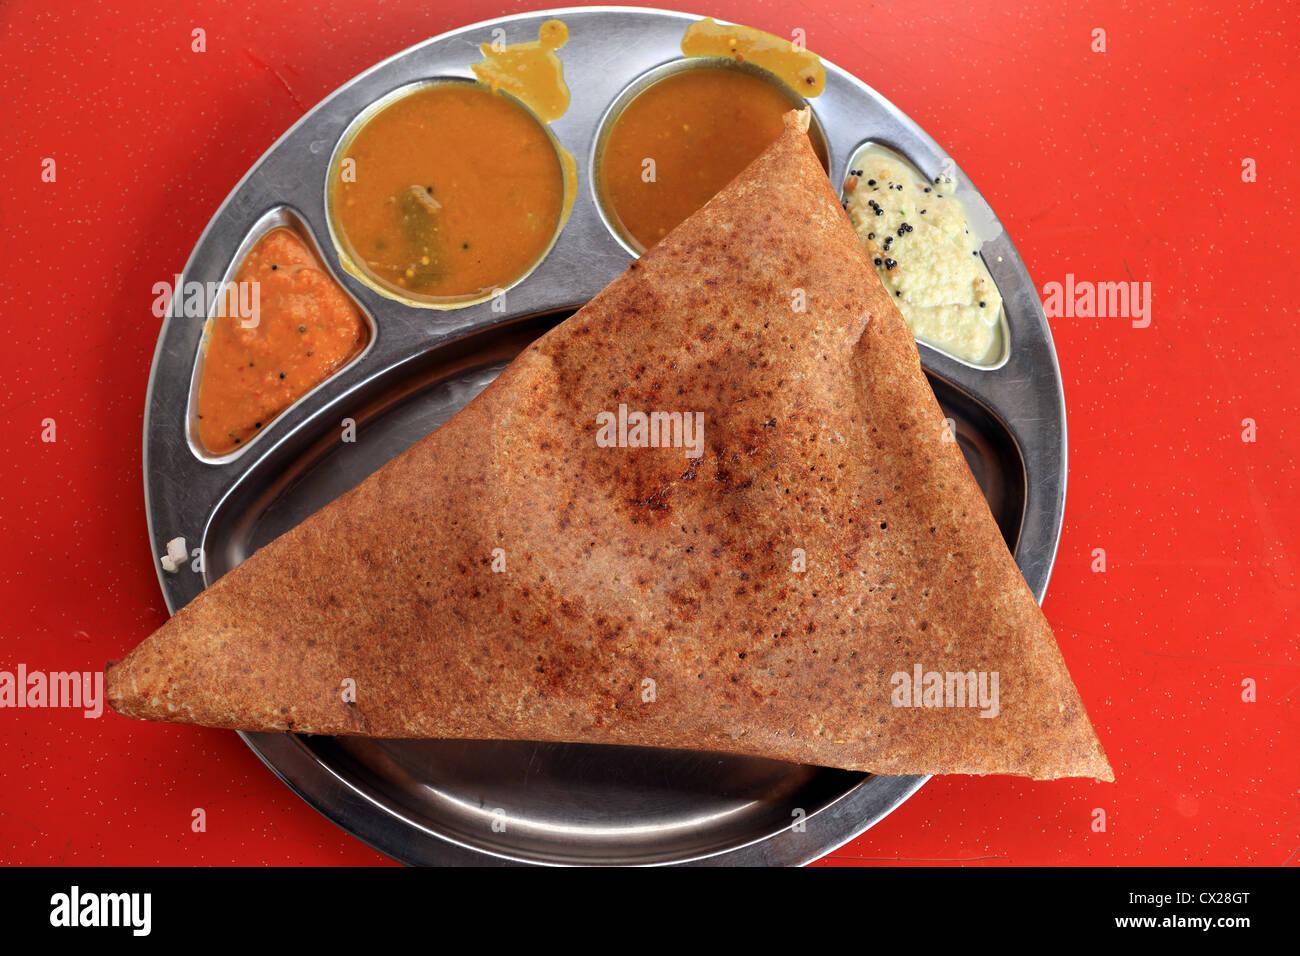 Cordero triángulo dosa thosai comida en Little India, Singapur. Imagen De Stock